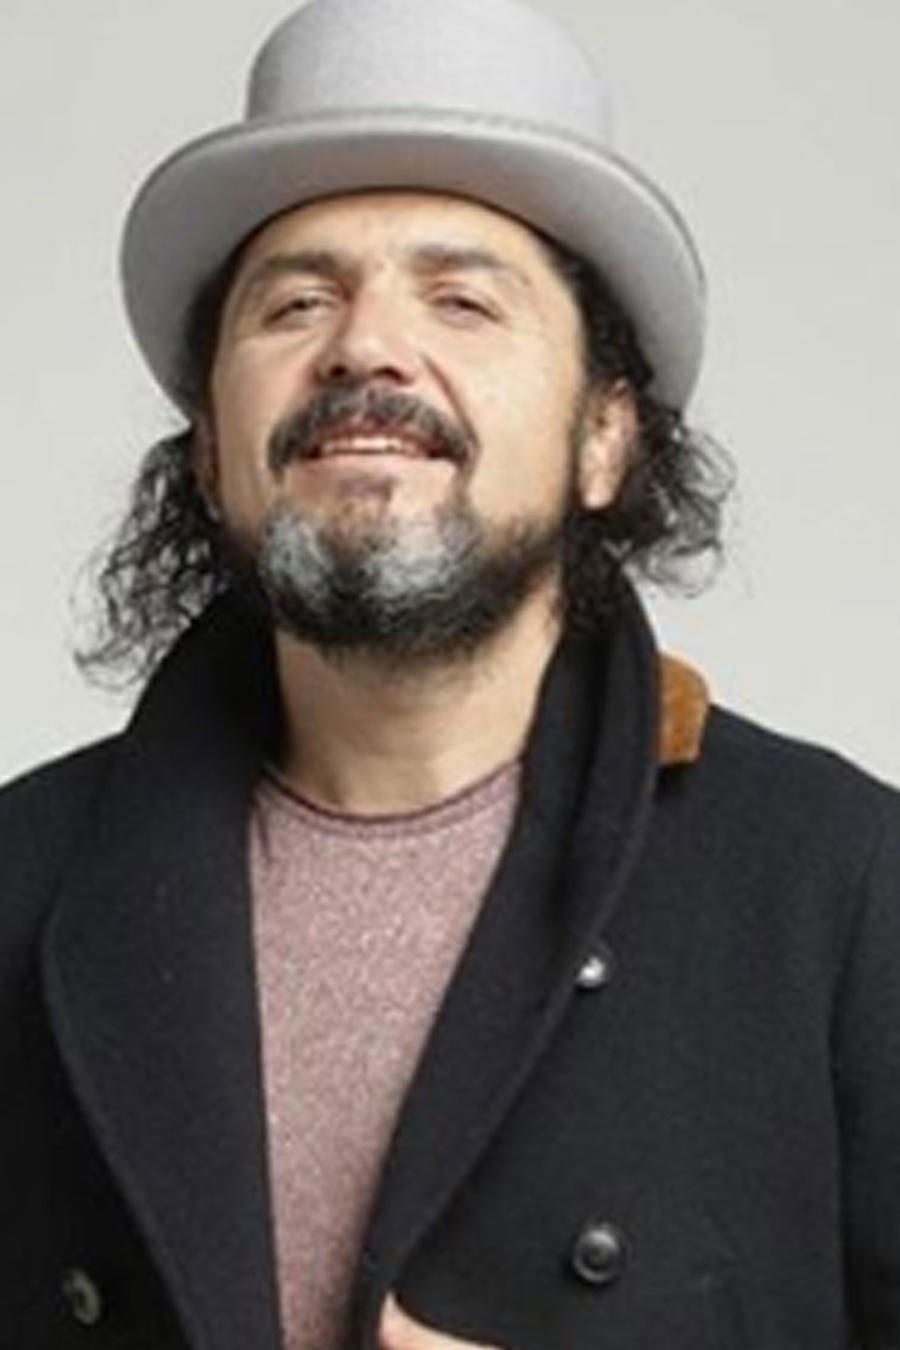 Reyli Barba posando con sombrero